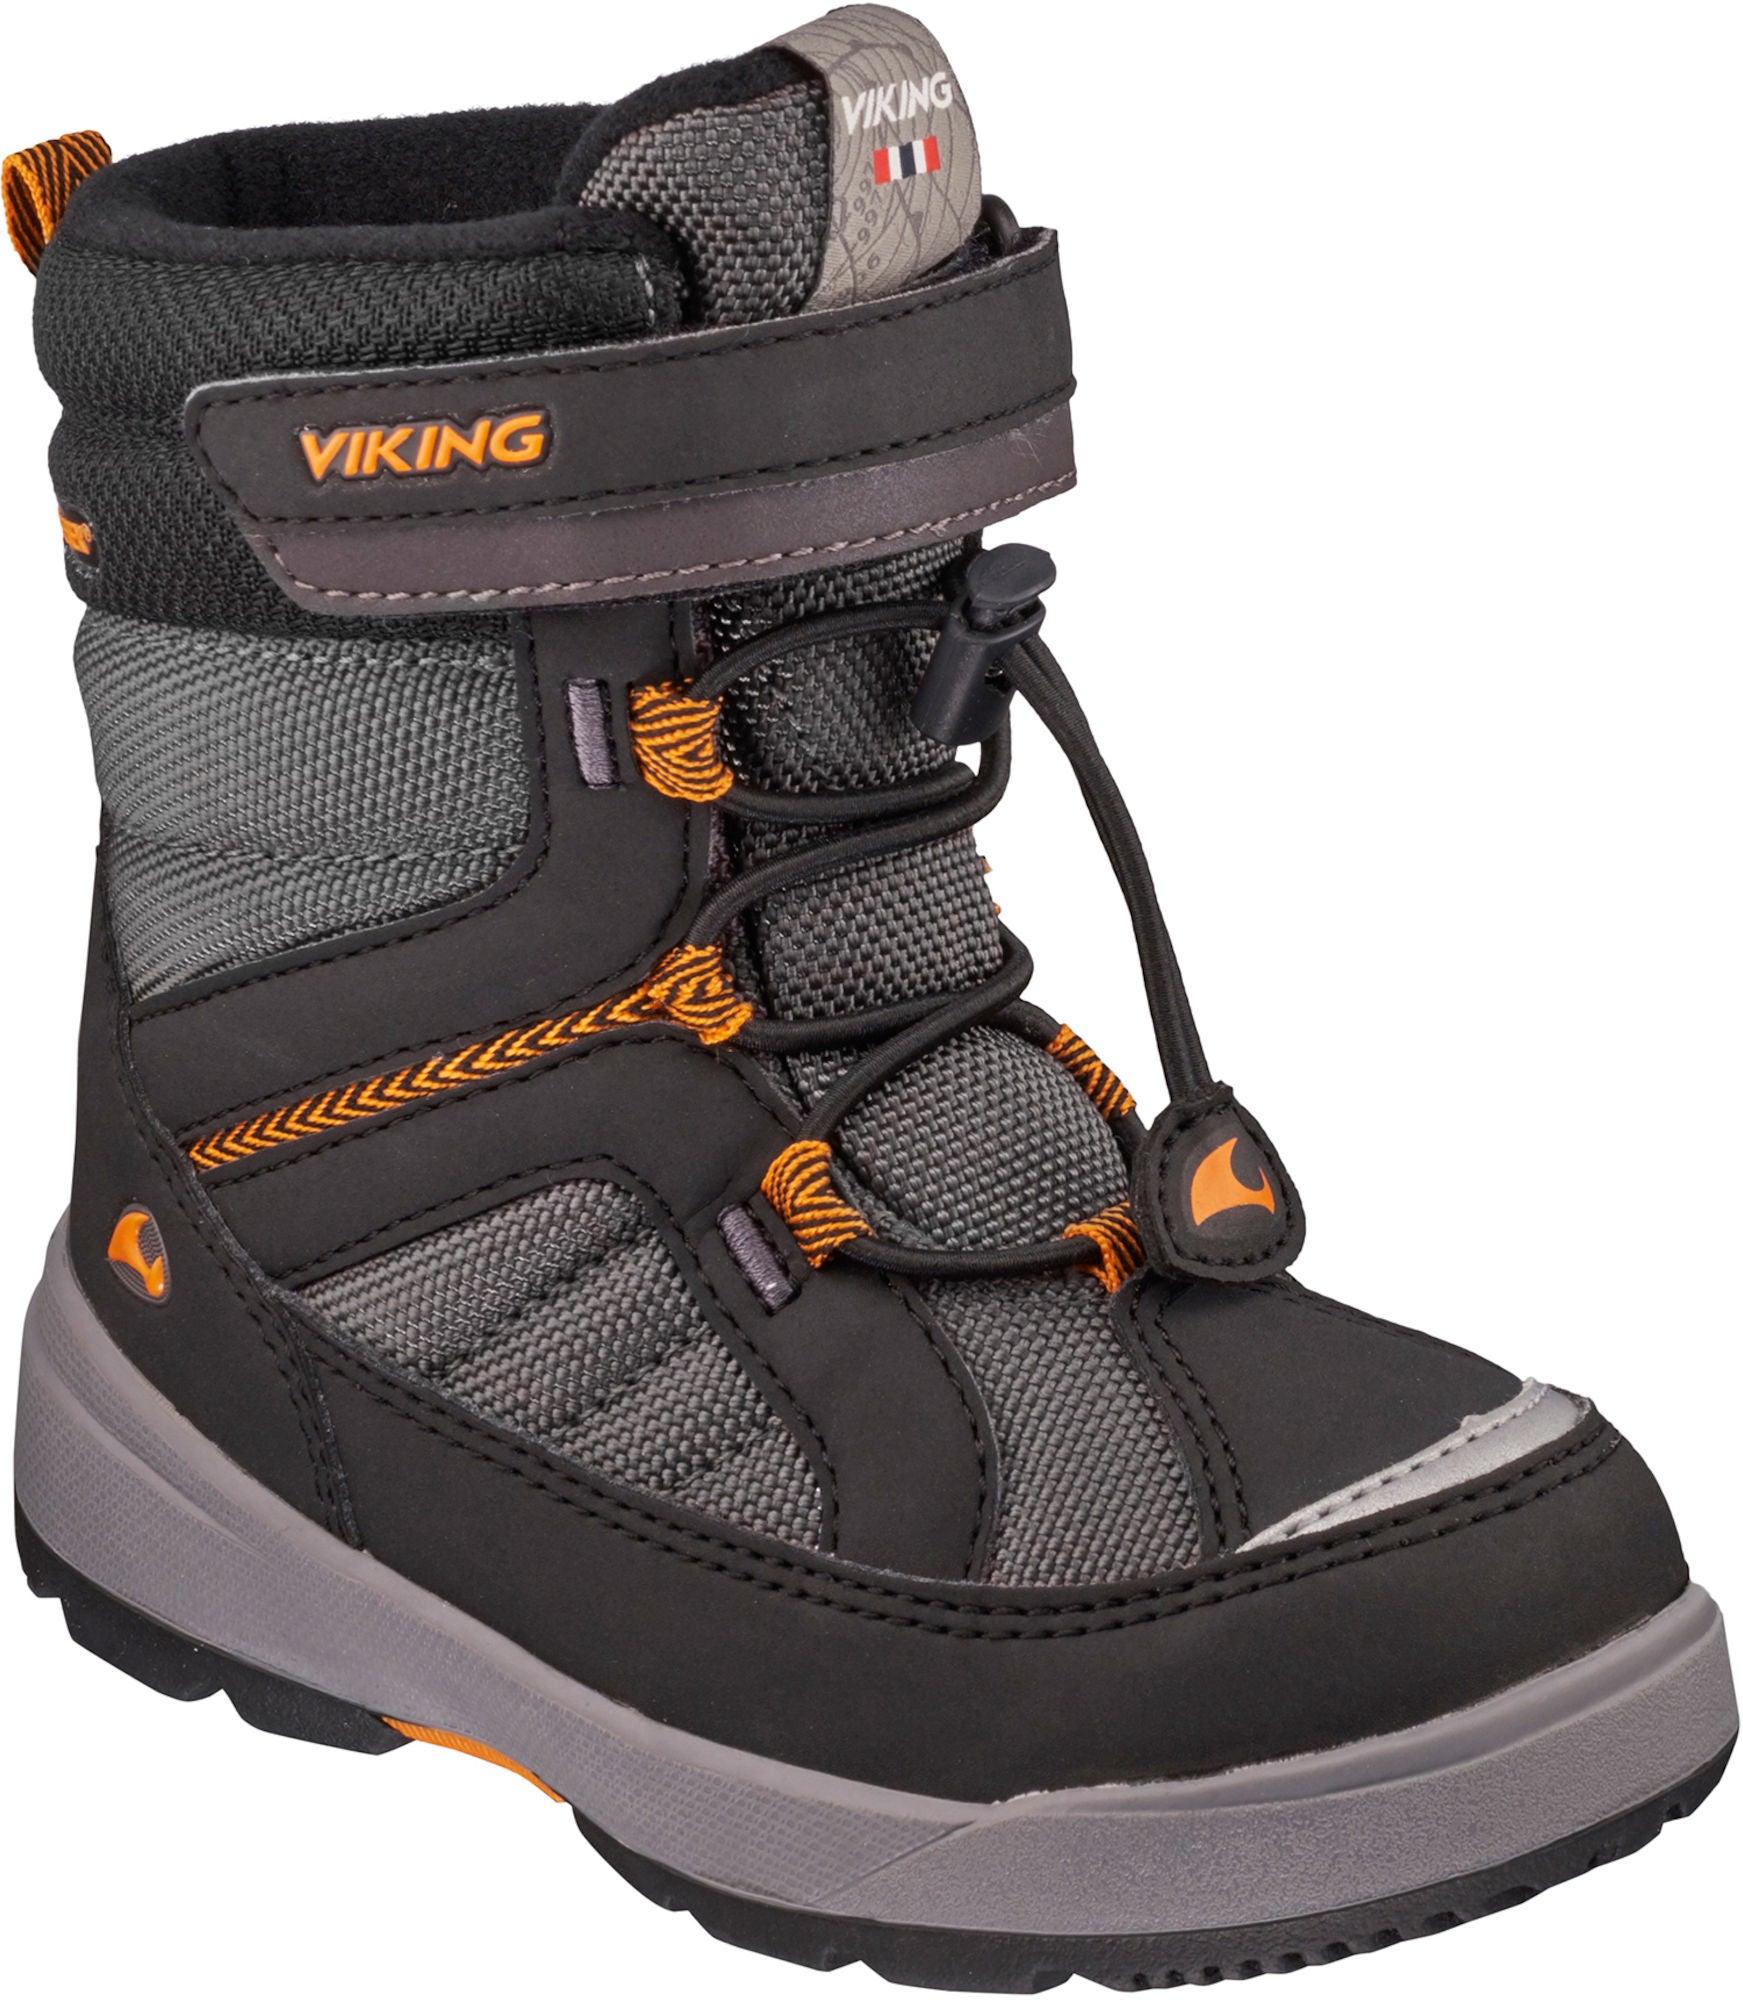 Viking, sko Nordens største utvalg av sko   FOOTWAY.no